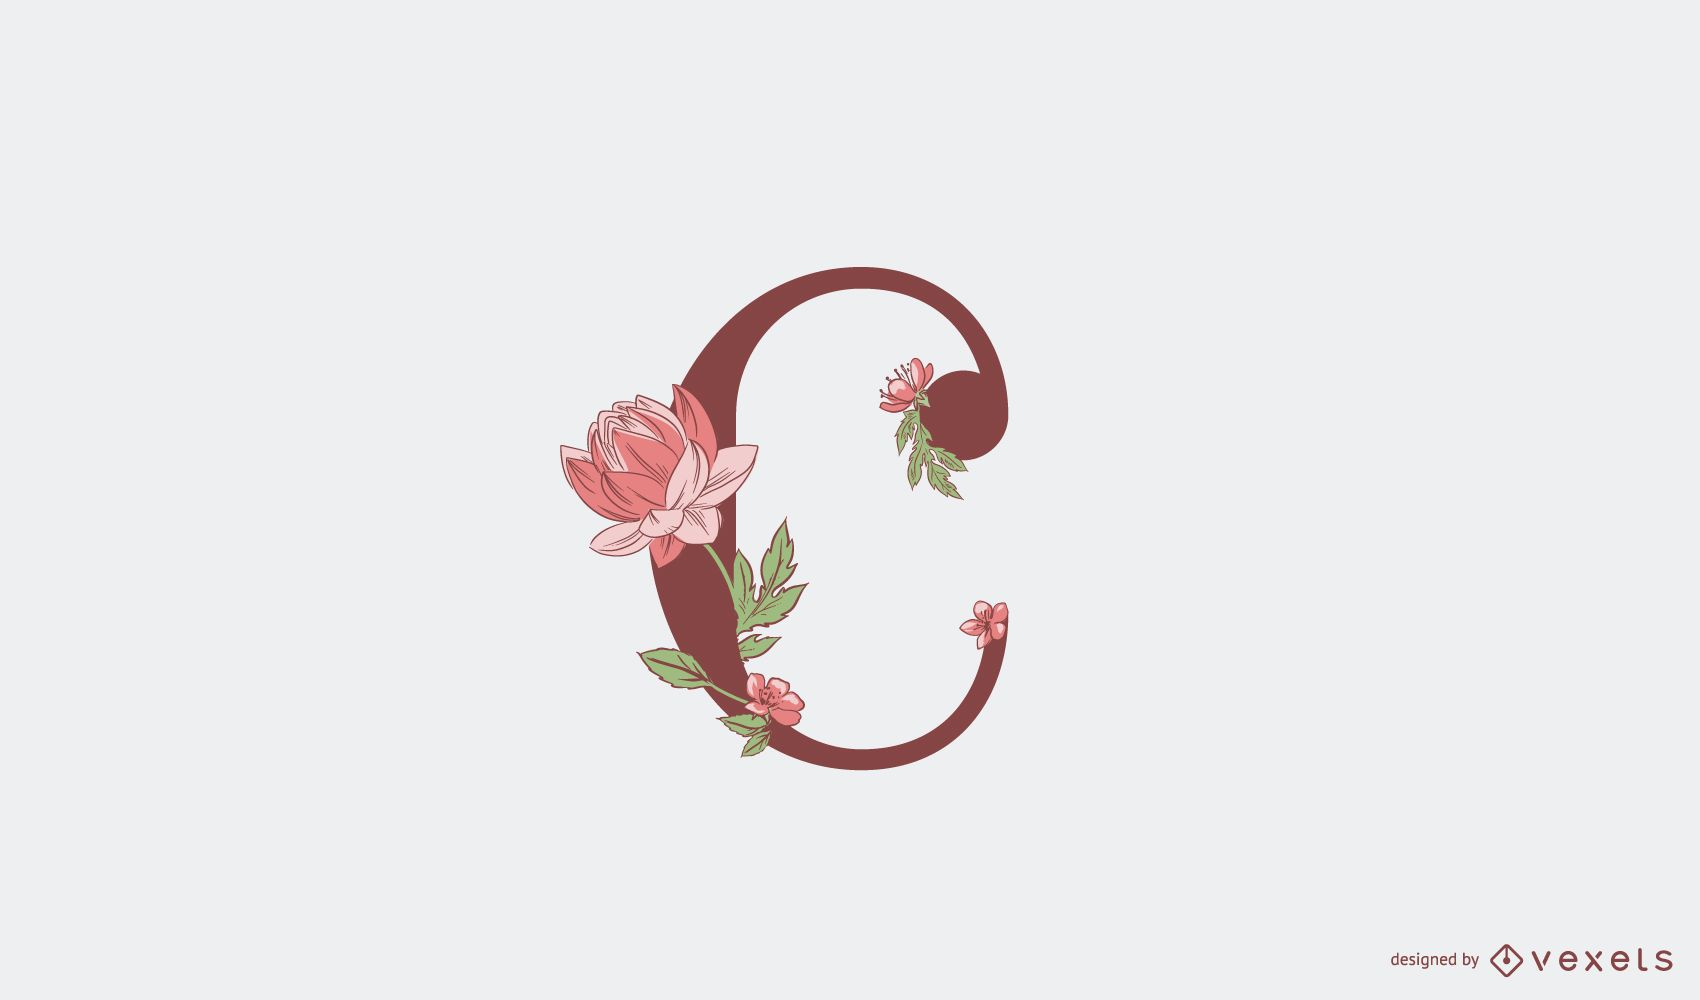 Floral letter c logo template